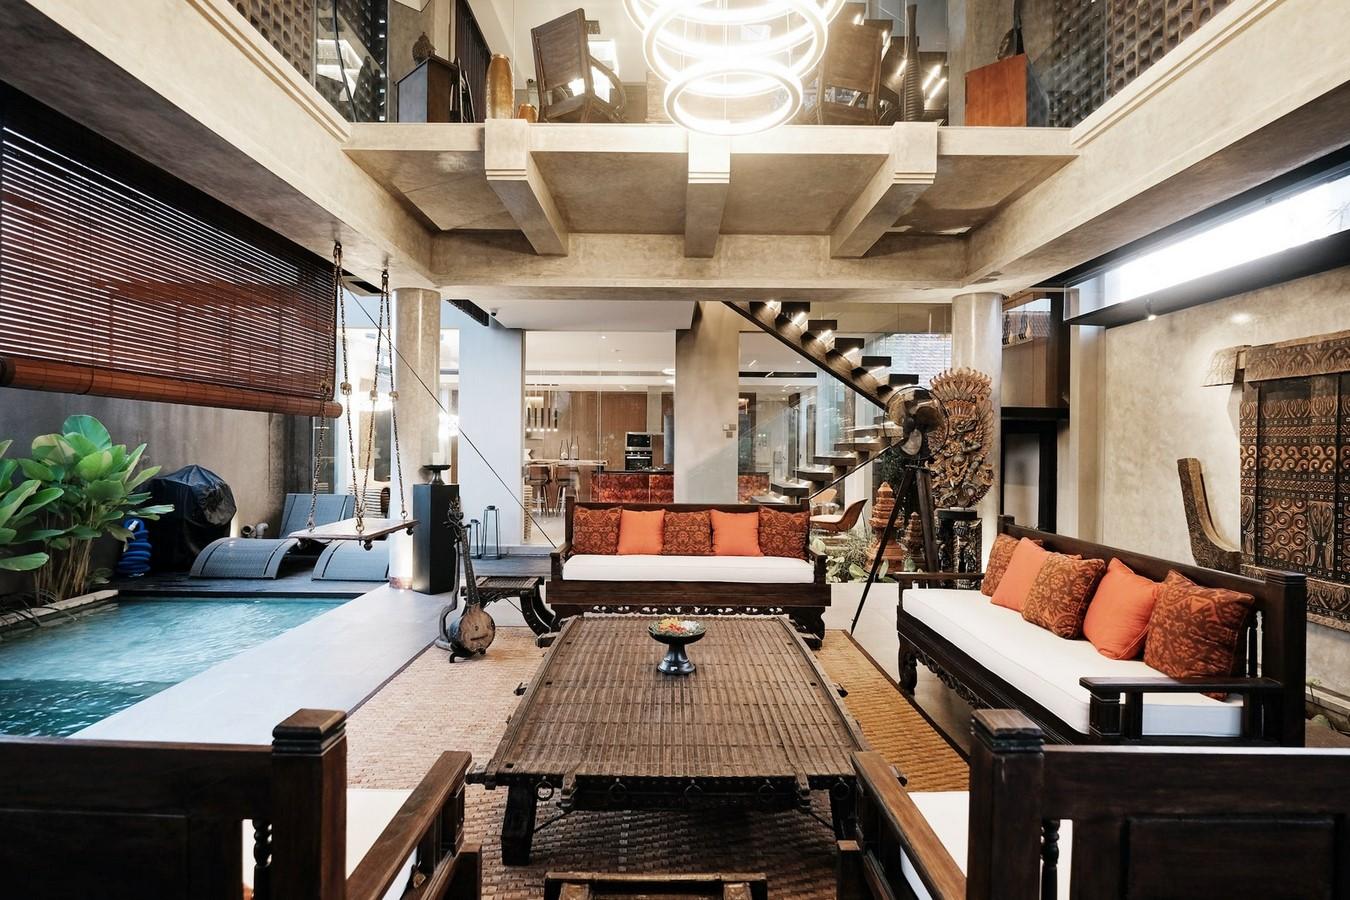 15 beautiful vintage apartments around the world - Sheet3